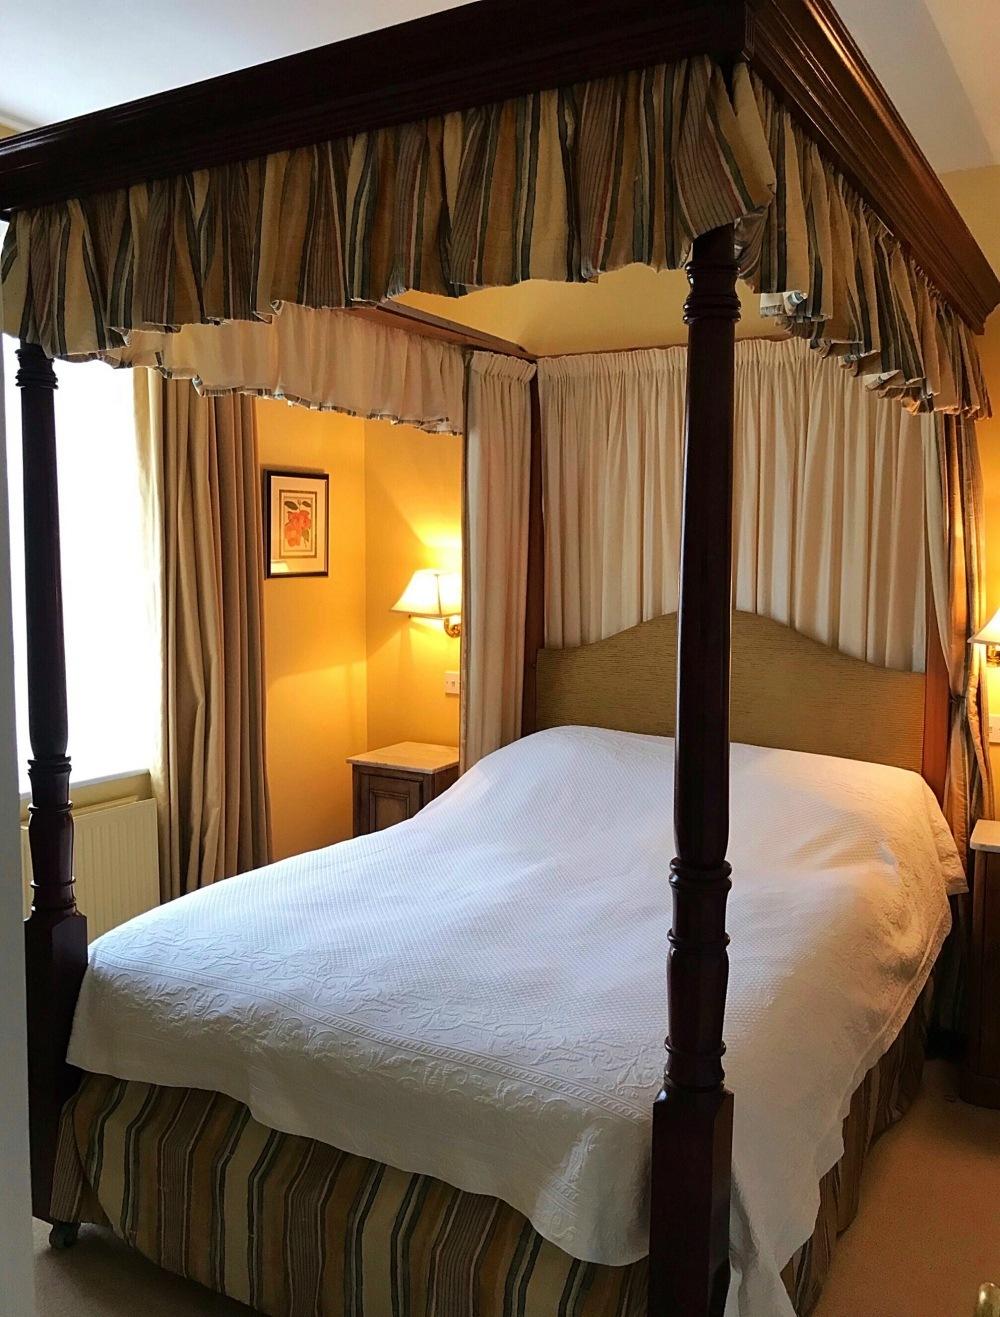 Master Bedroom Sandown - Bruern Cottages - Photo Heatheronhertravels.com